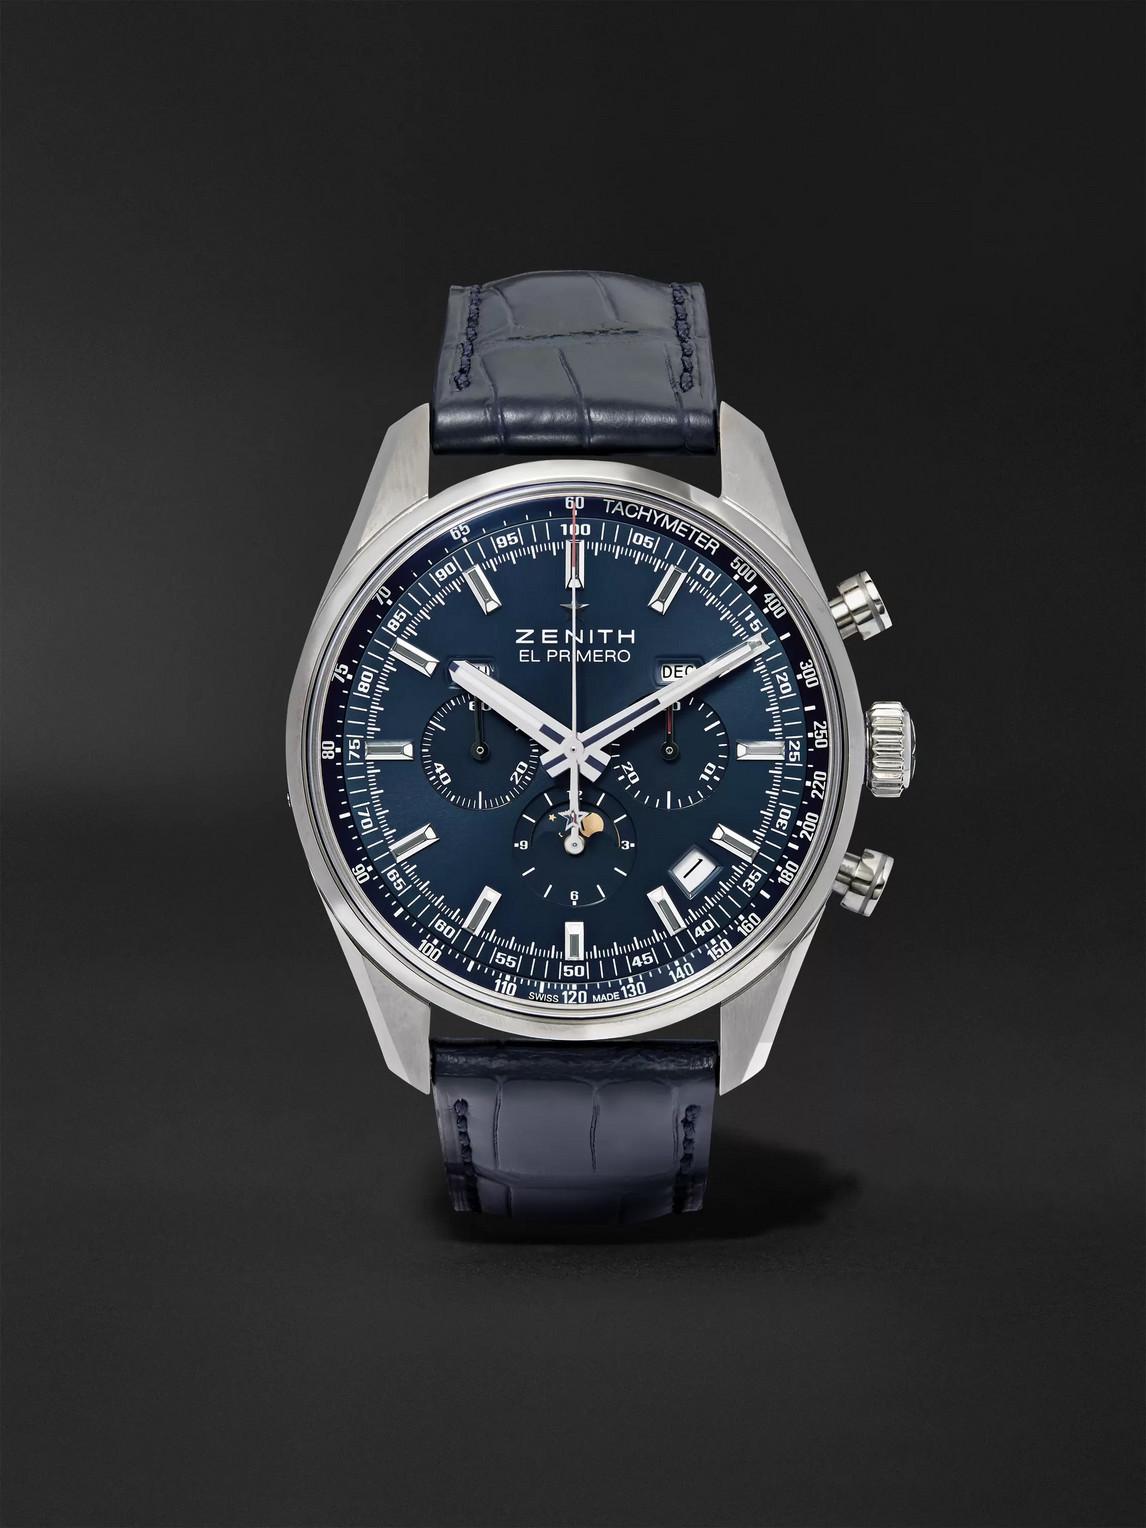 Zenith El Primero 410 42mm Stainless Steel And Alligator Watch, Ref. No. 03.2097.410/51.c700 In Blue